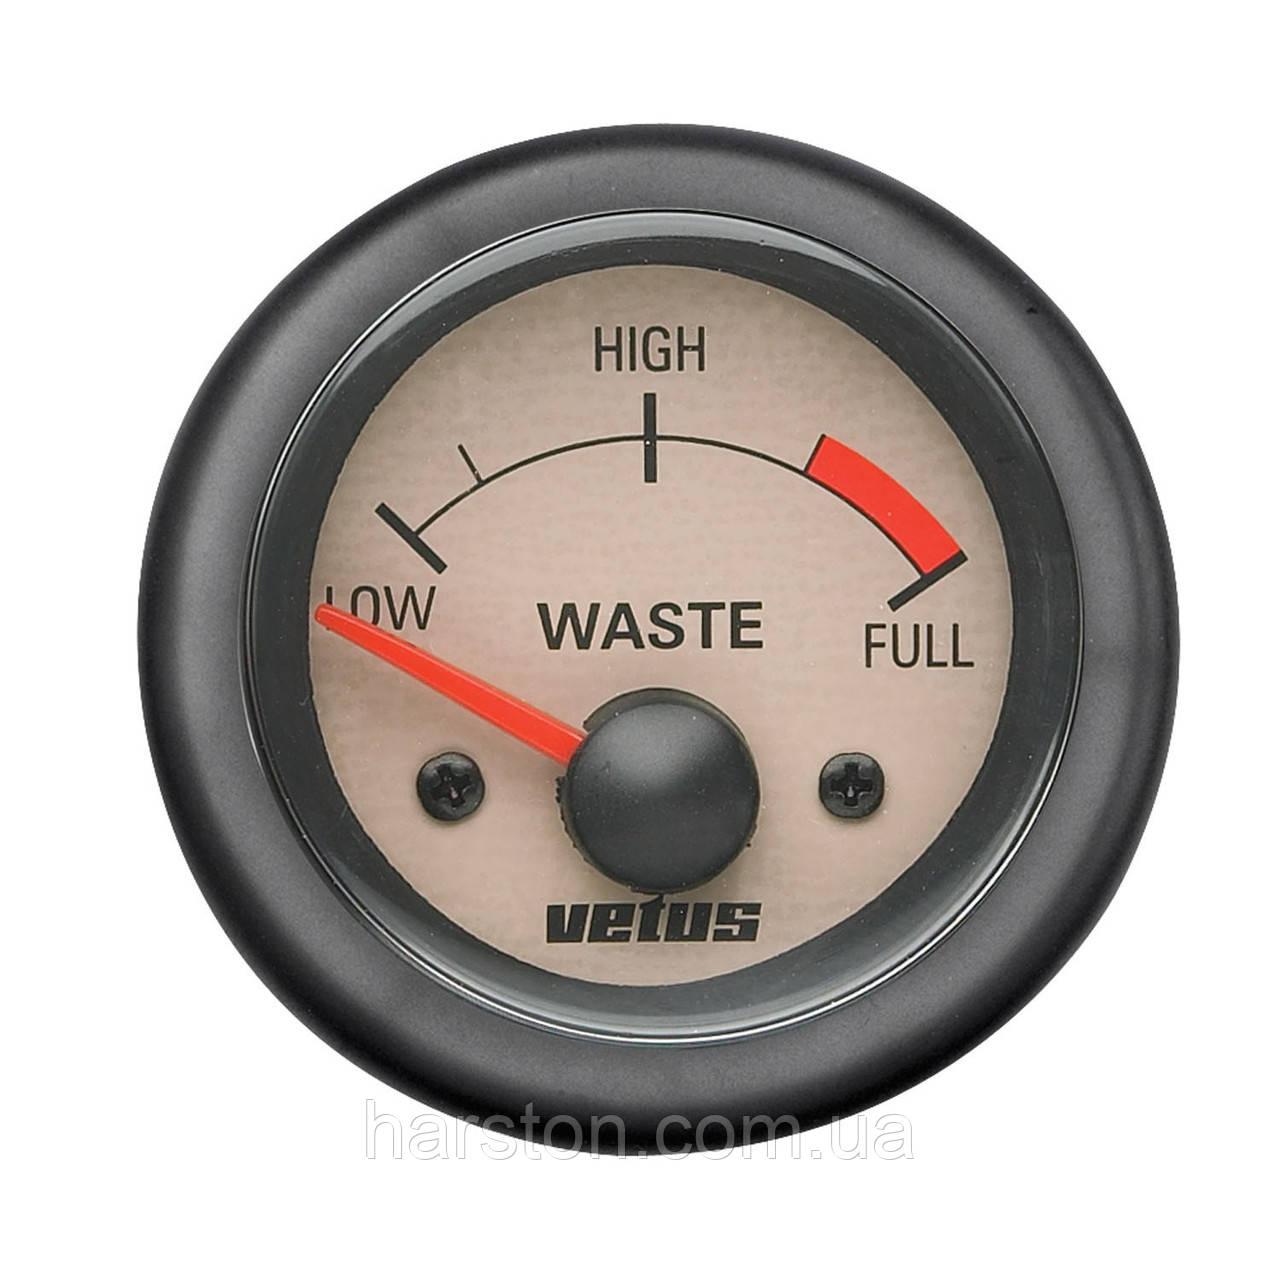 Датчик сточных вод VETUS WASTE12W (WASTE24W)